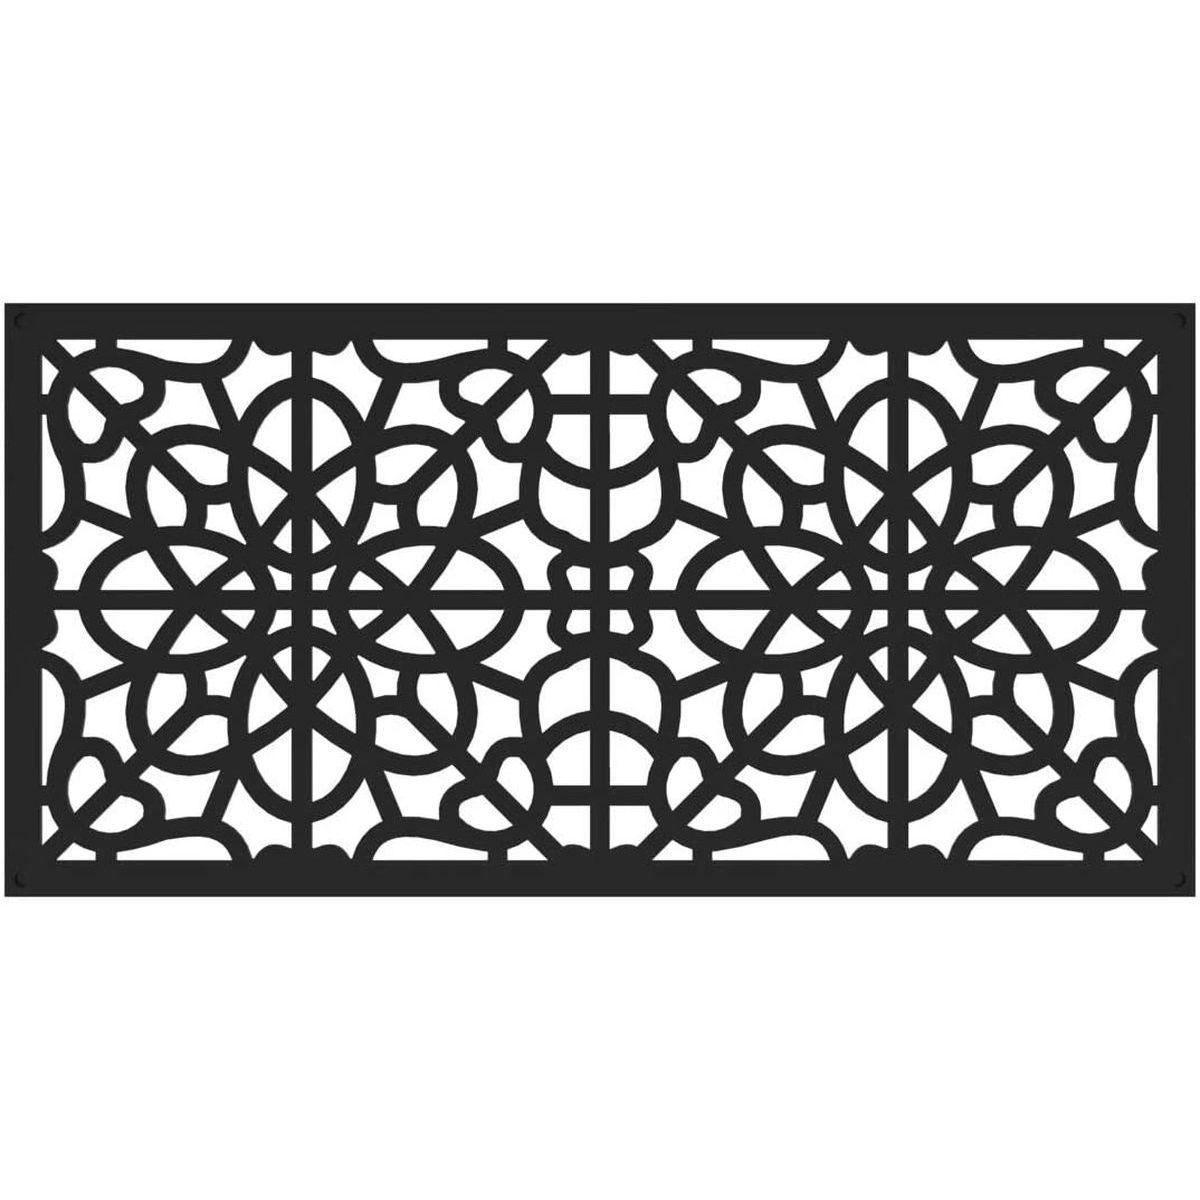 RDI 73004786 Fretwork Decorative Screen Panels - Black